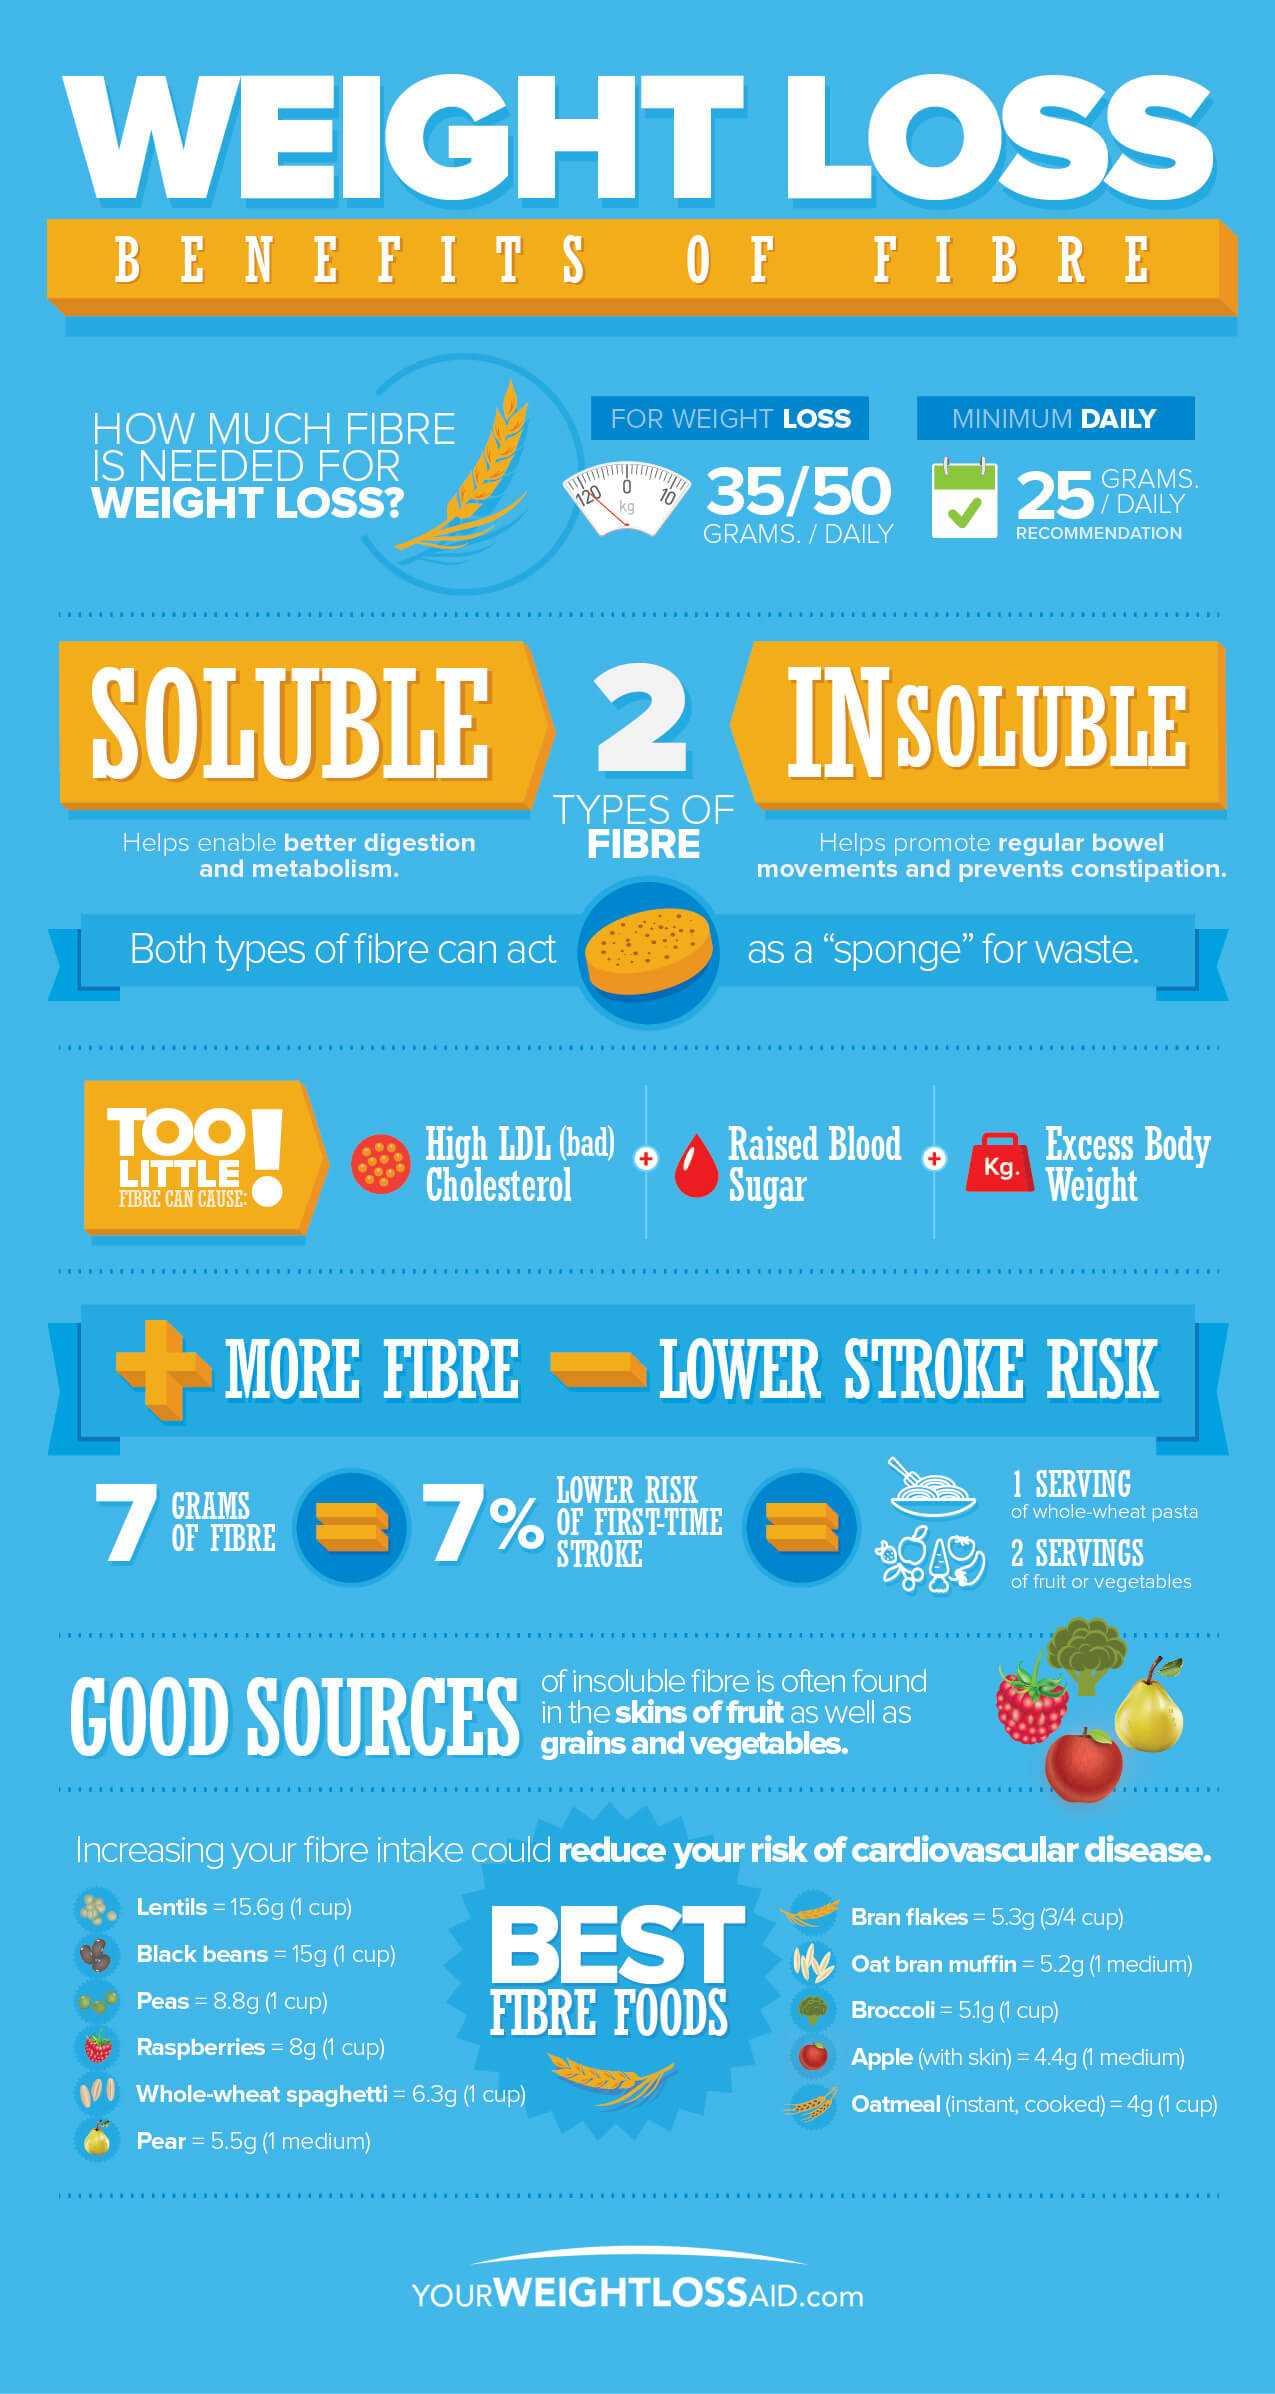 Weight Loss Benefits Of Fibre